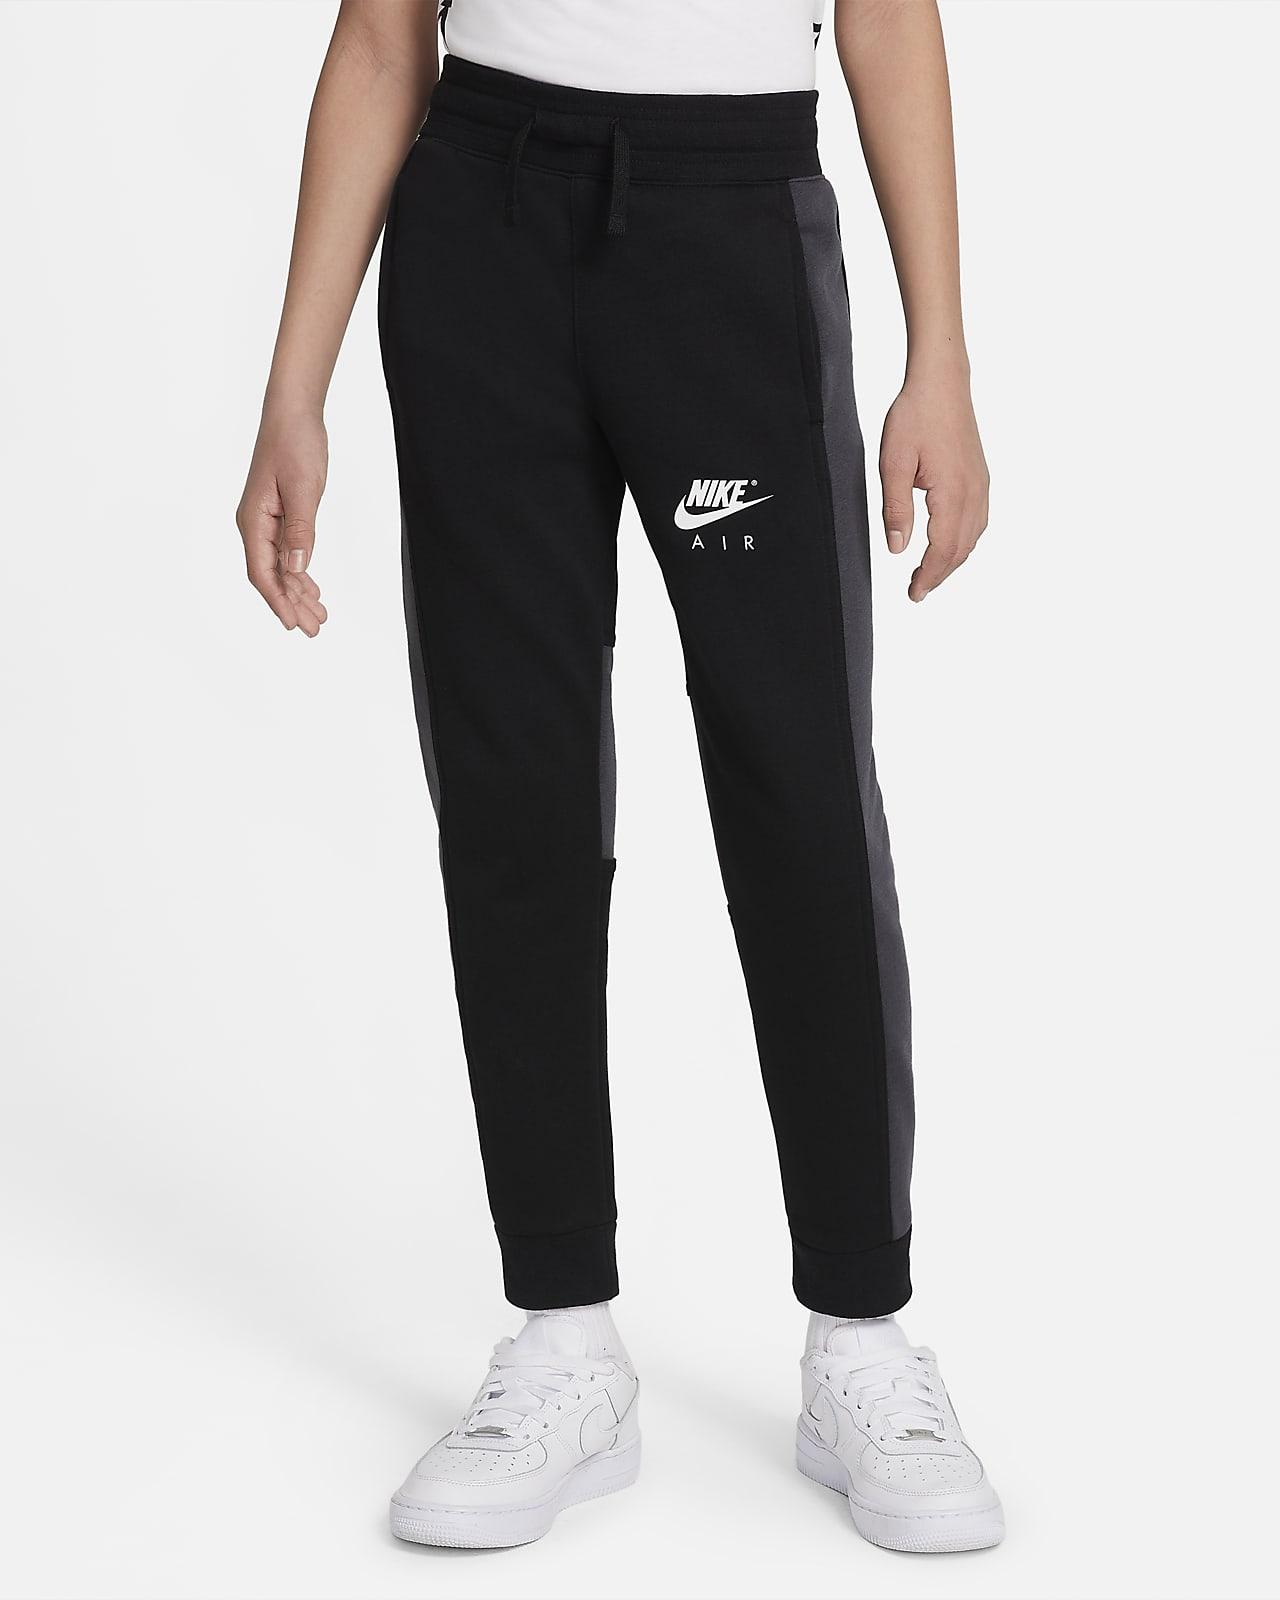 Pantaloni Nike Air - Ragazzo